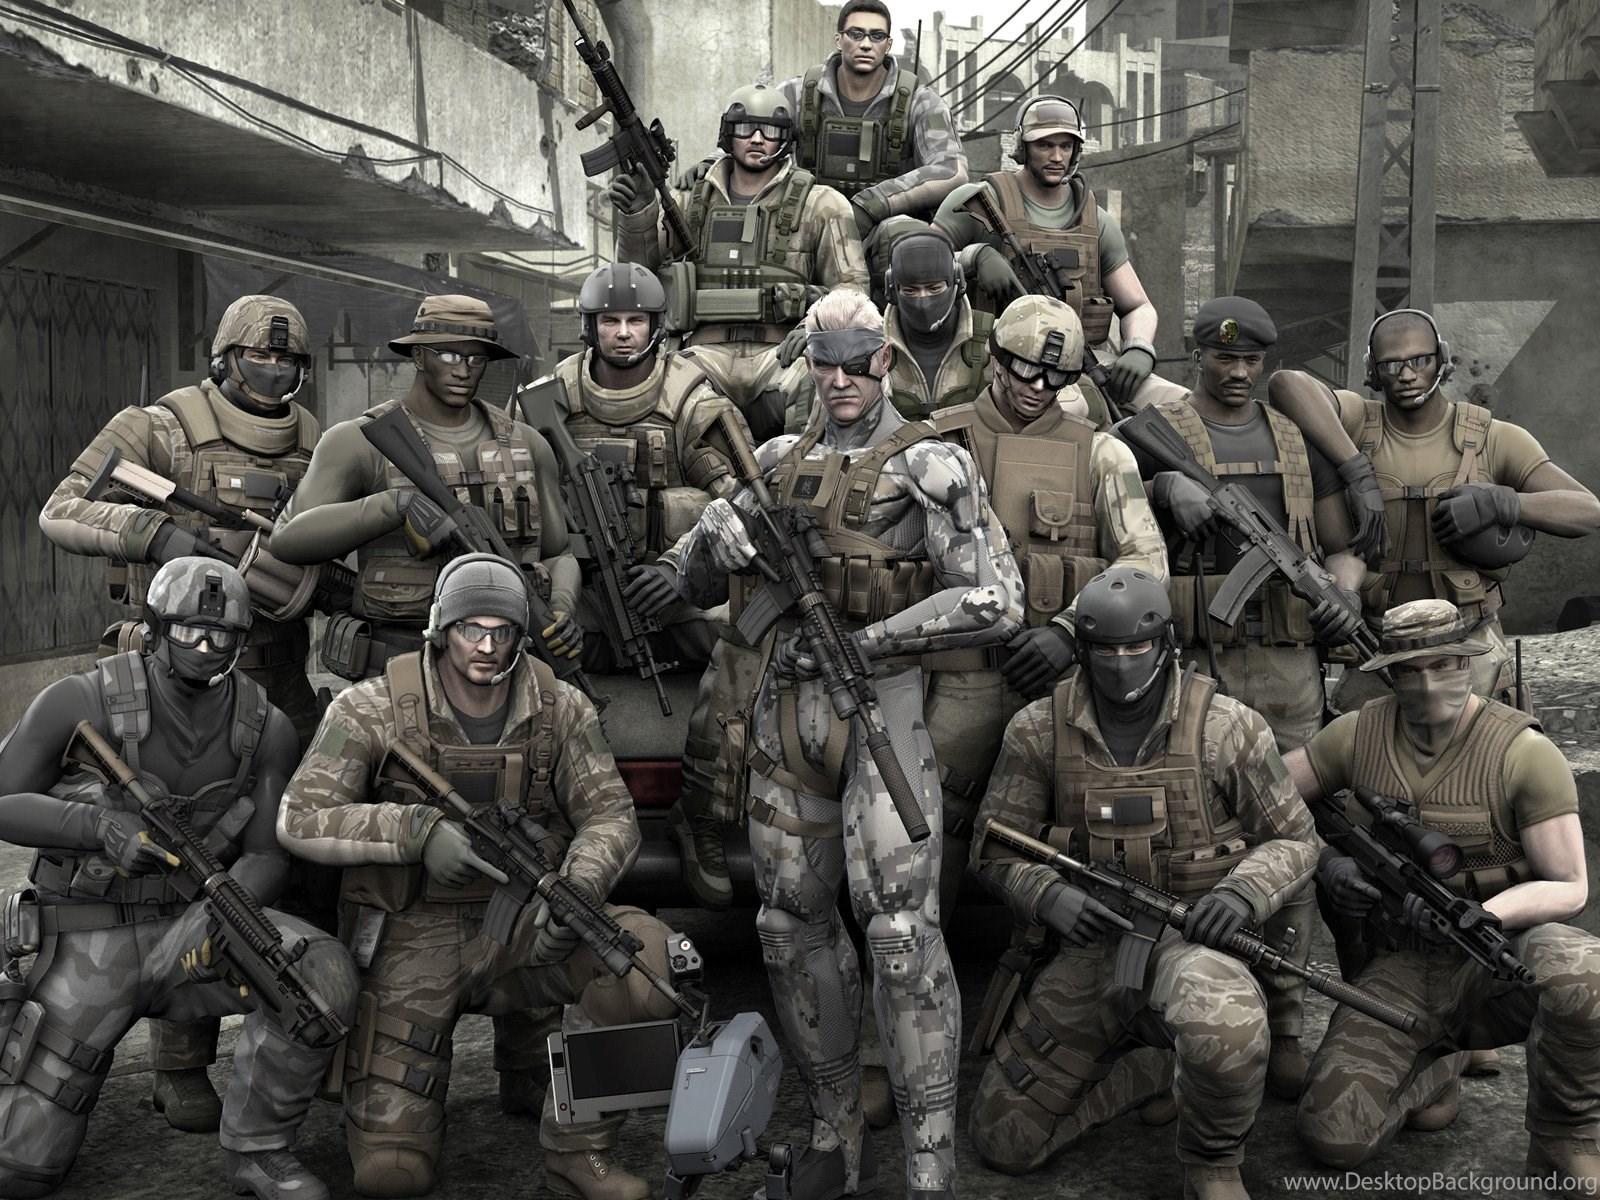 Metal Gear Solid Wallpapers Hd 1080p Desktop Background